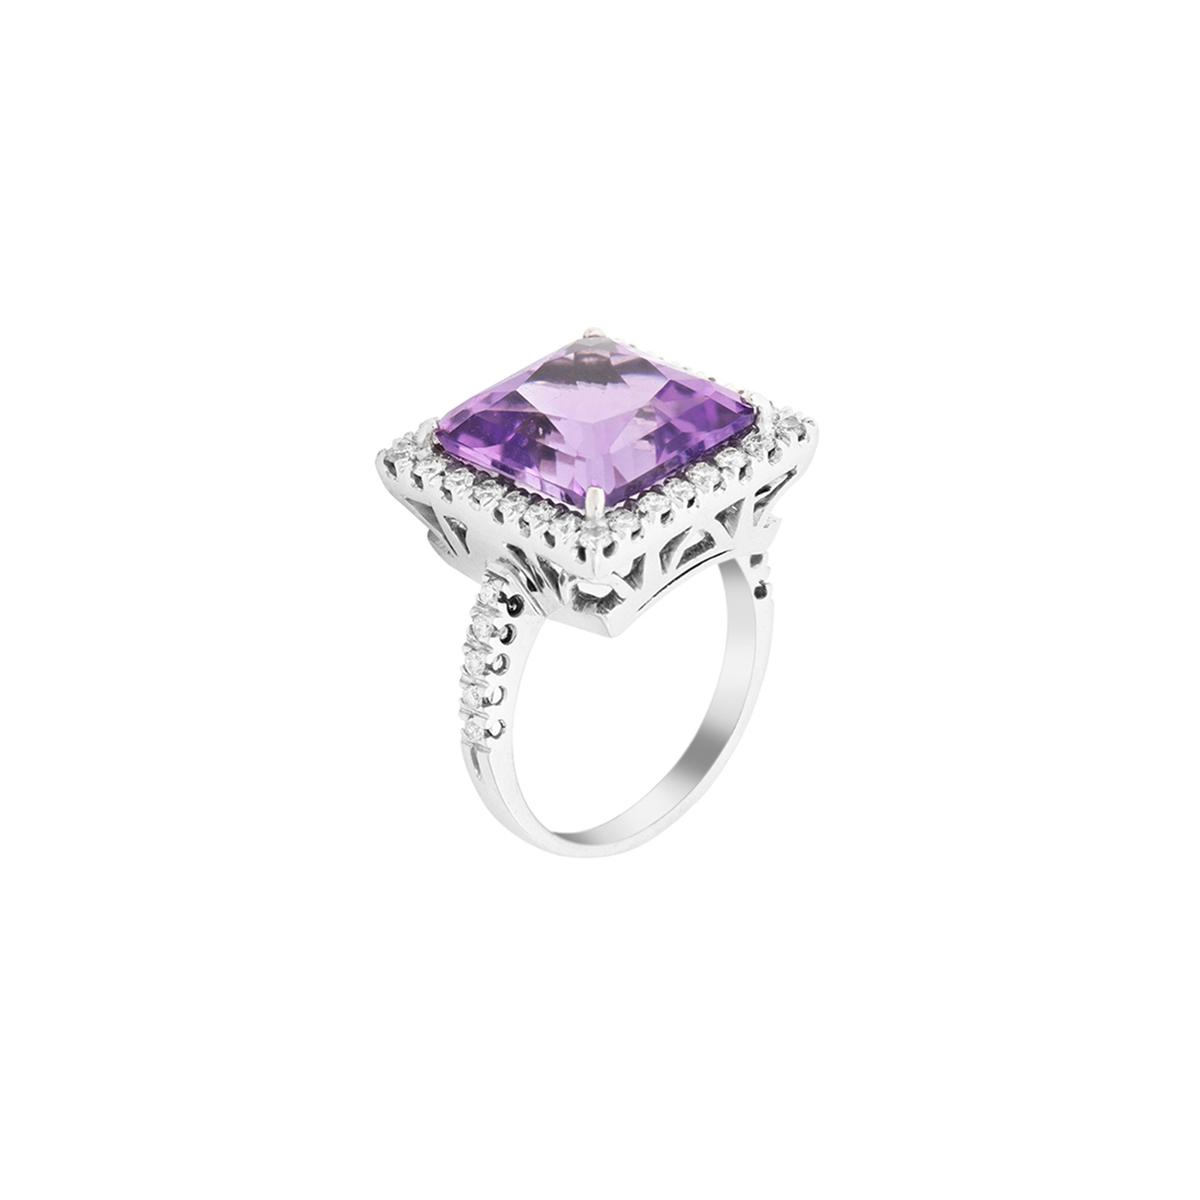 Princess-Cut Halo Amethyst and Diamond Engagement Ring